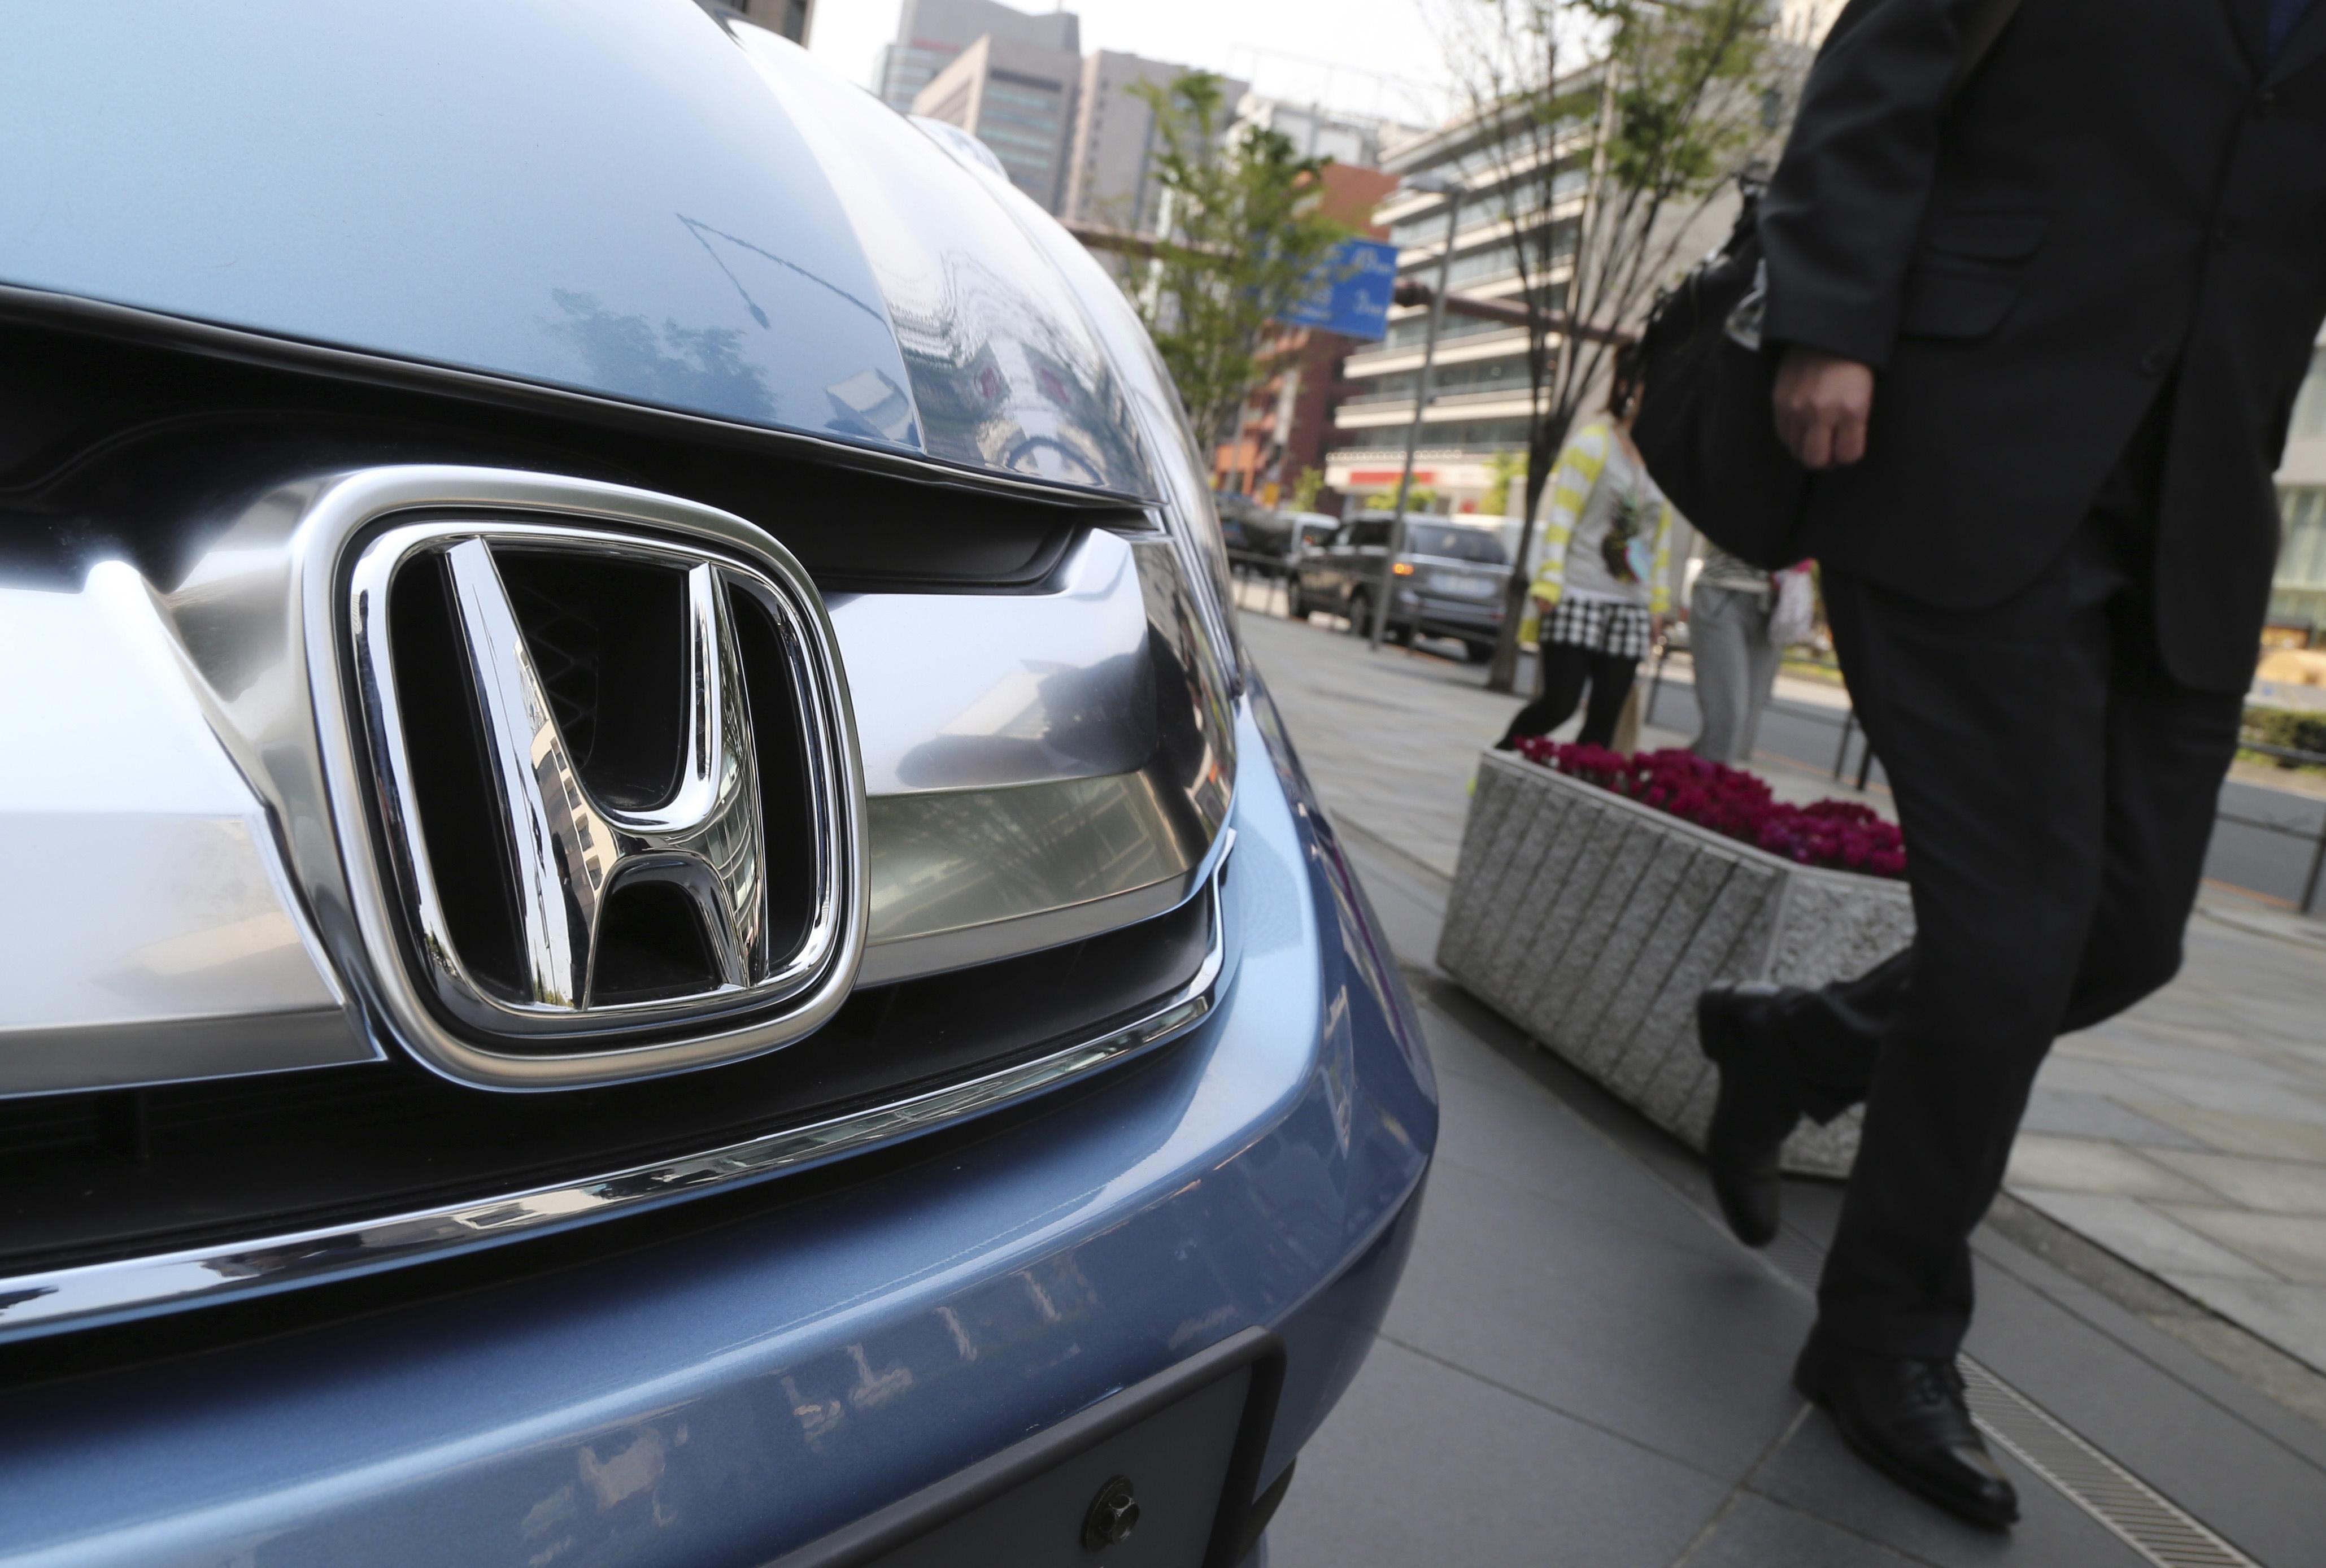 A man walks past a Honda model on display at Honda Motor Co. headquarters in Tokyo on April 25, 2014.